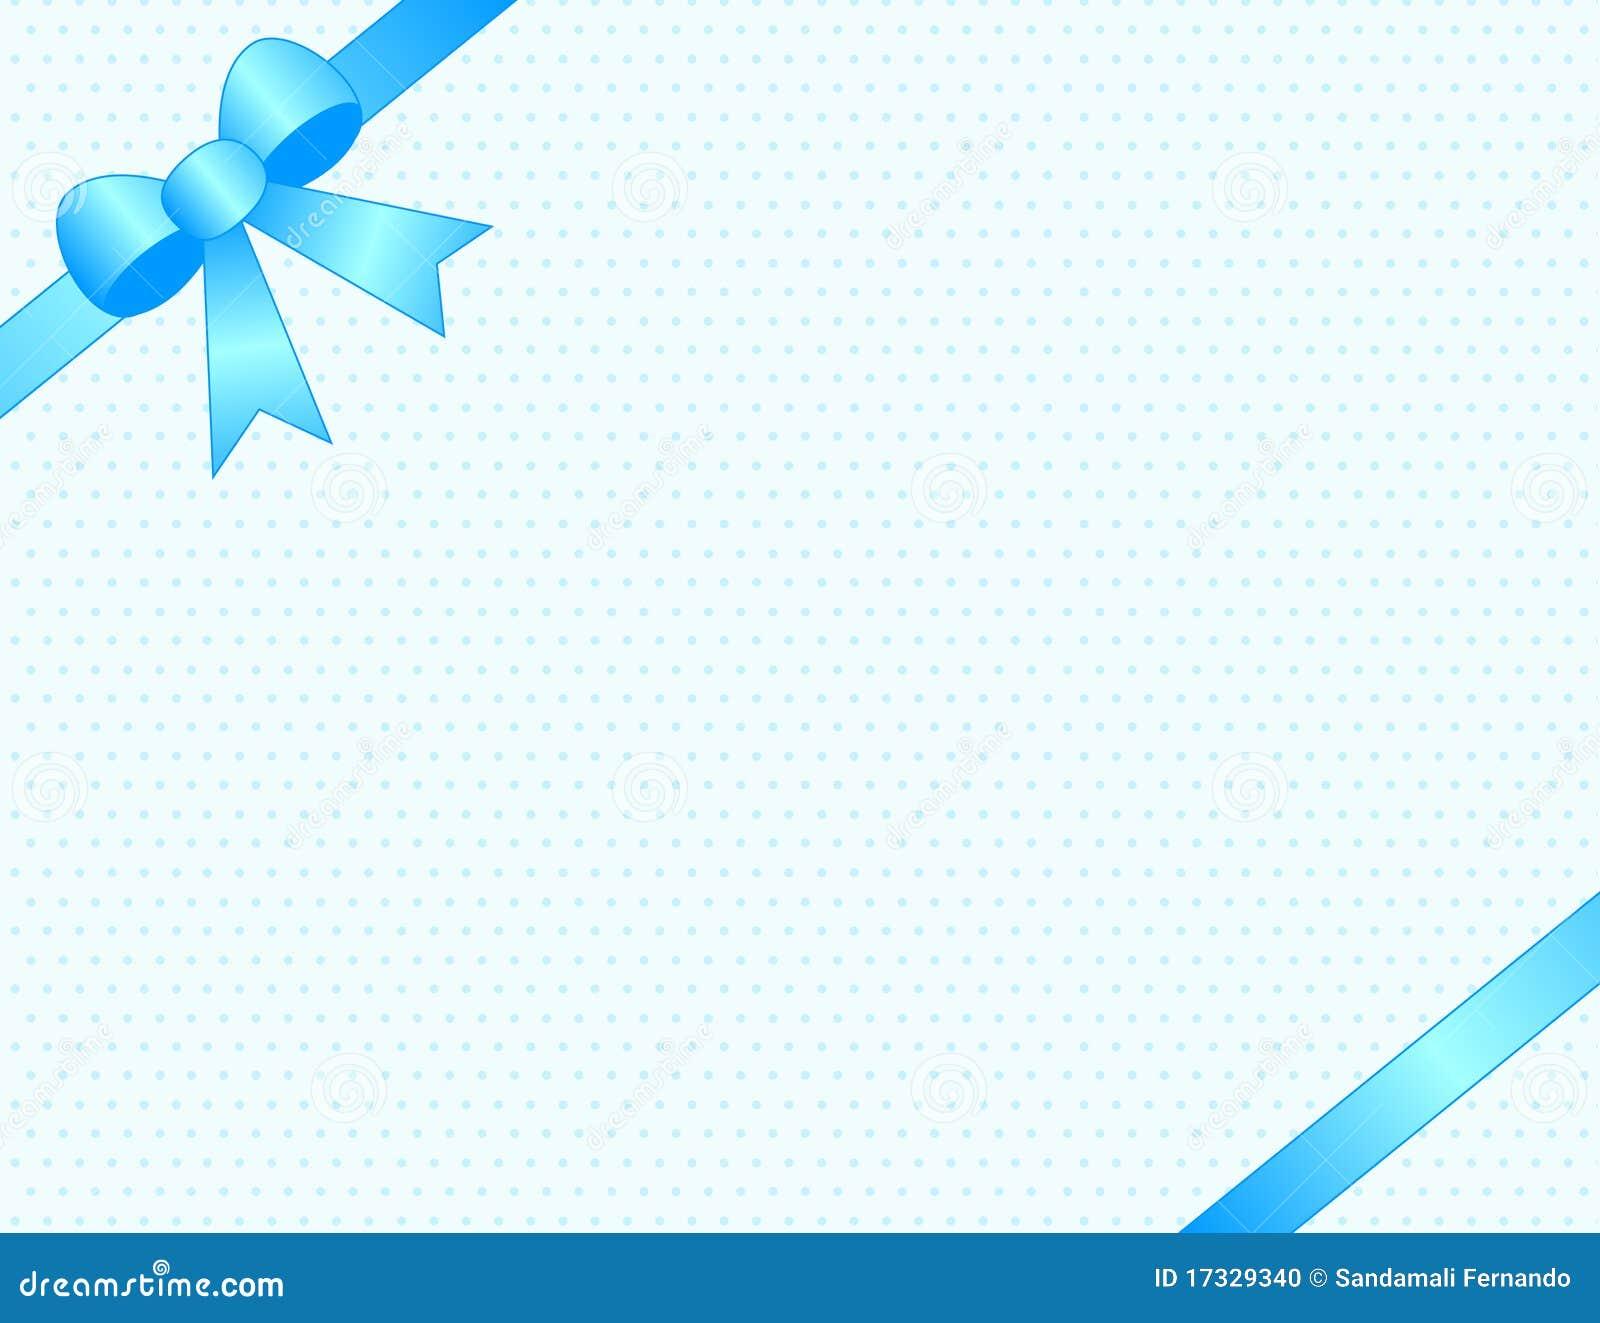 Baby Boy Invitation Stock Photo - Image: 17329340